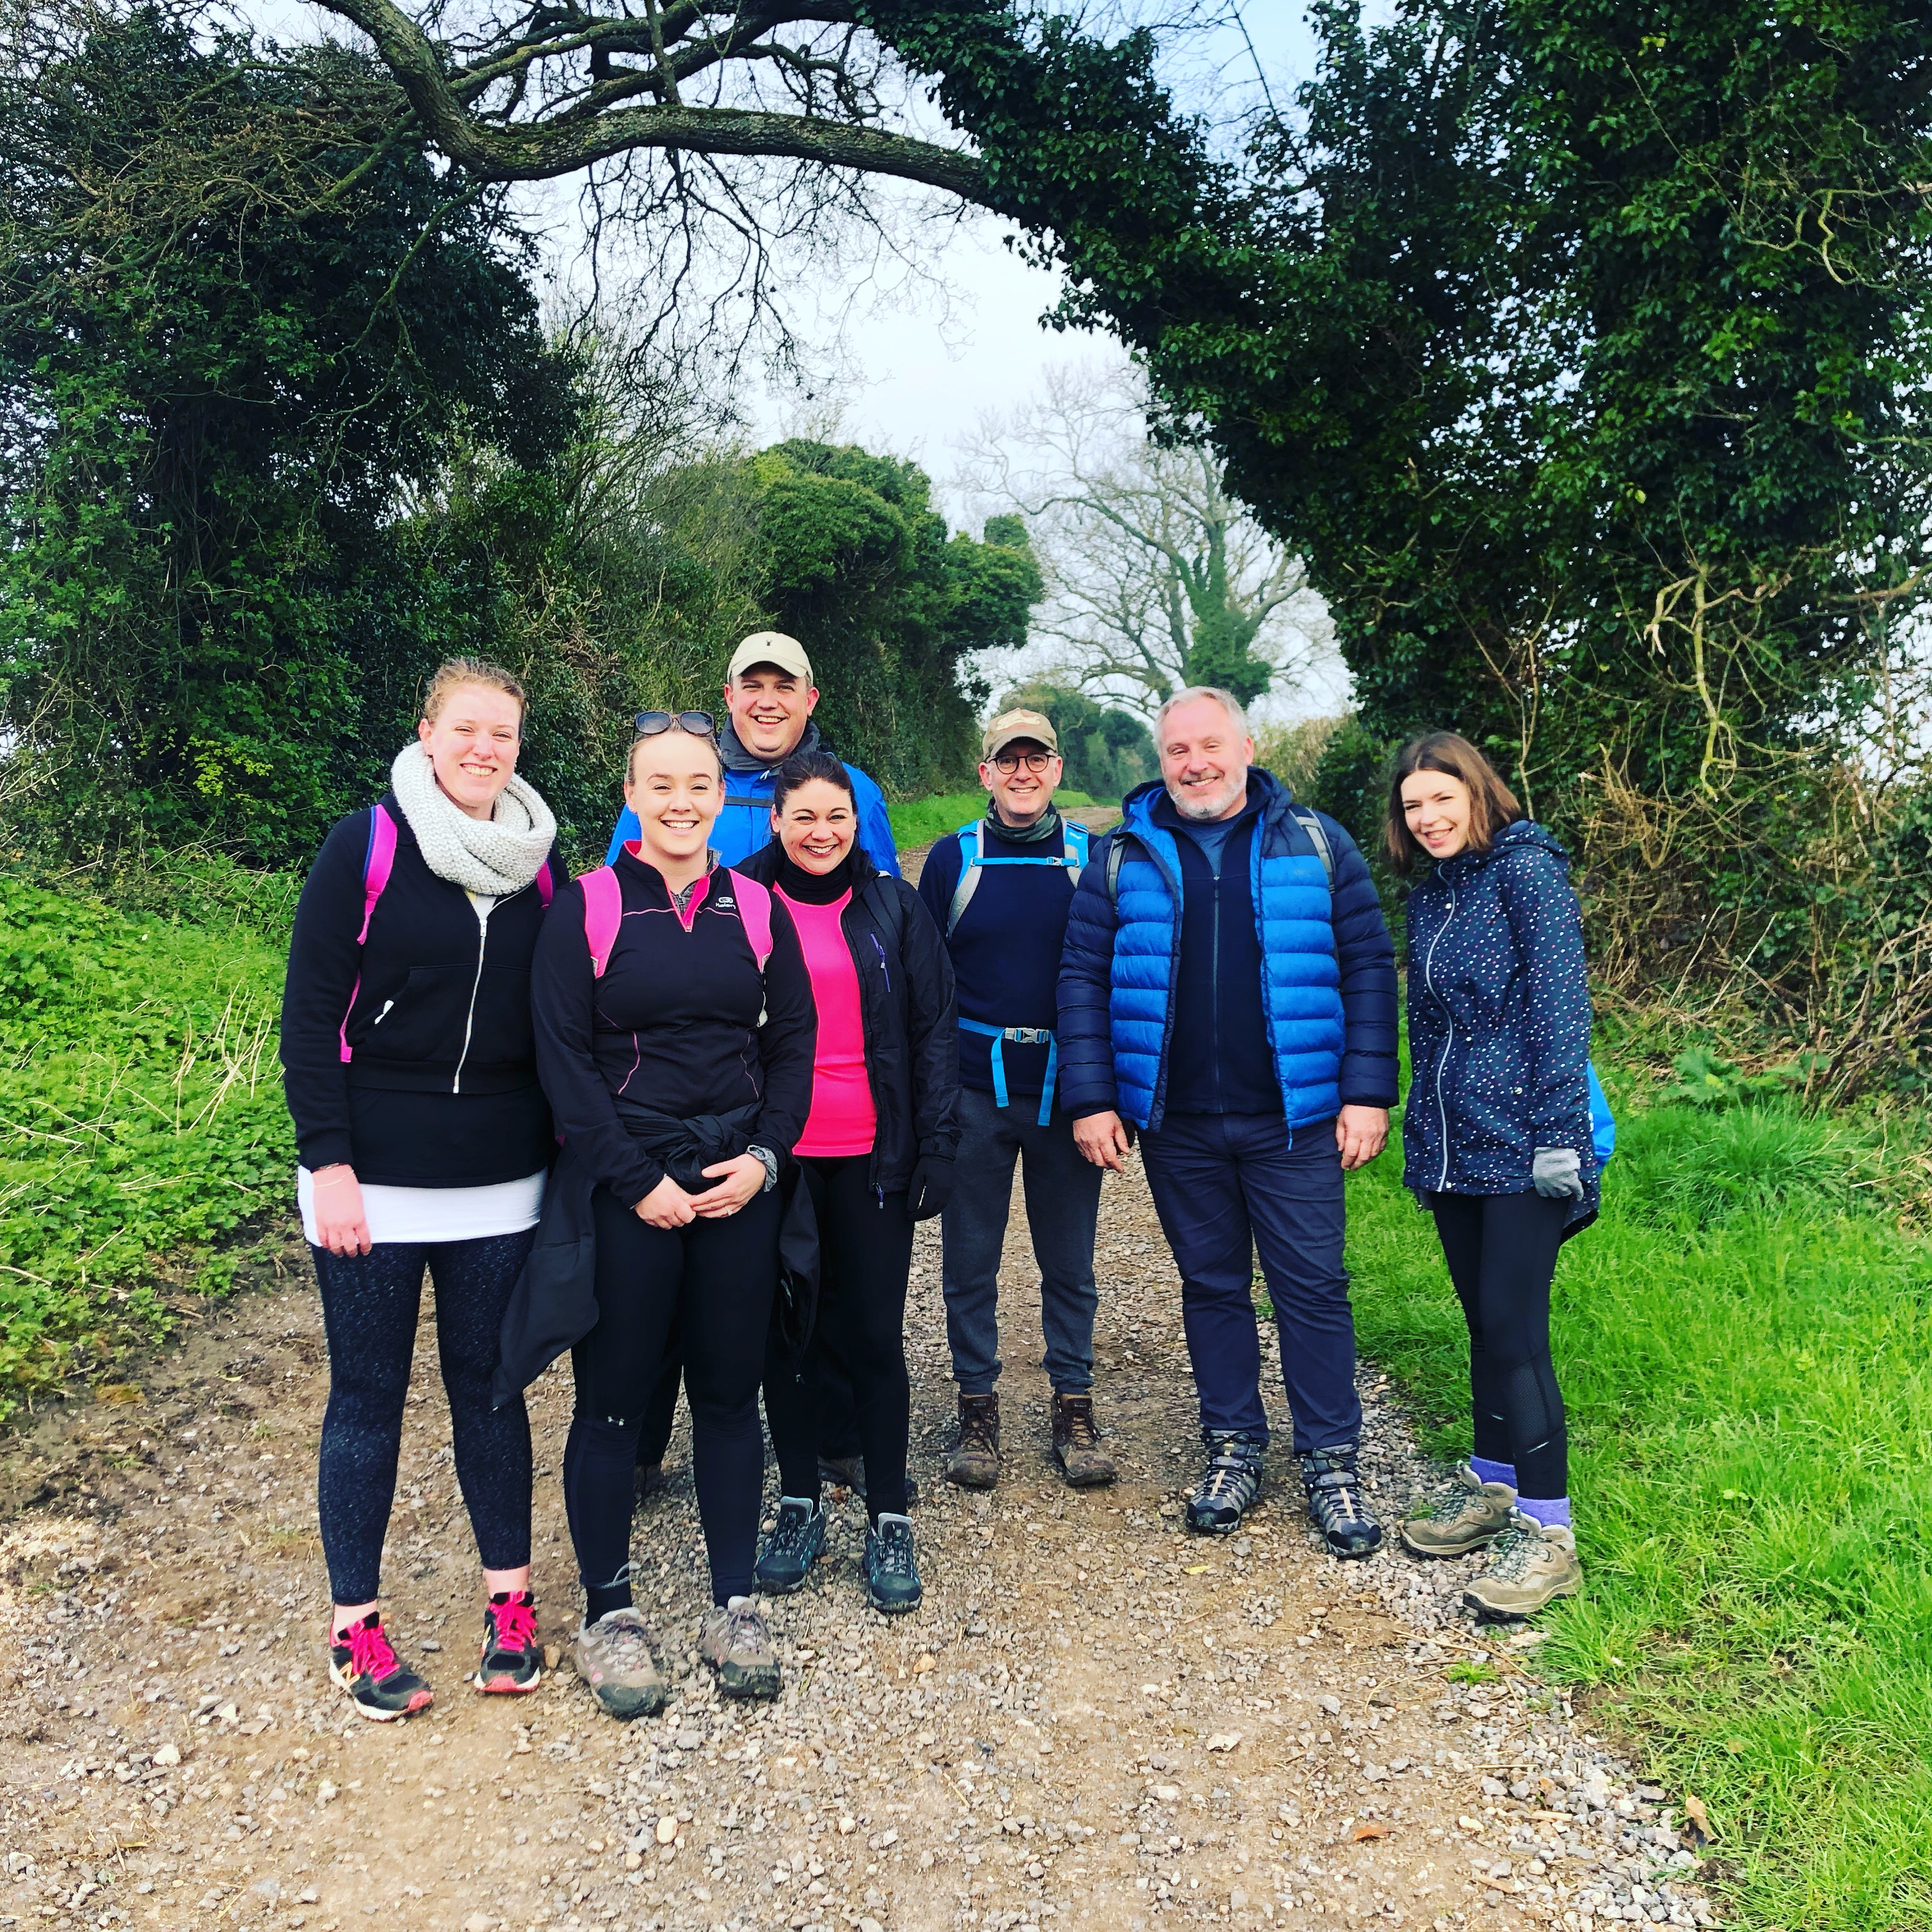 leightons 100km run group photo